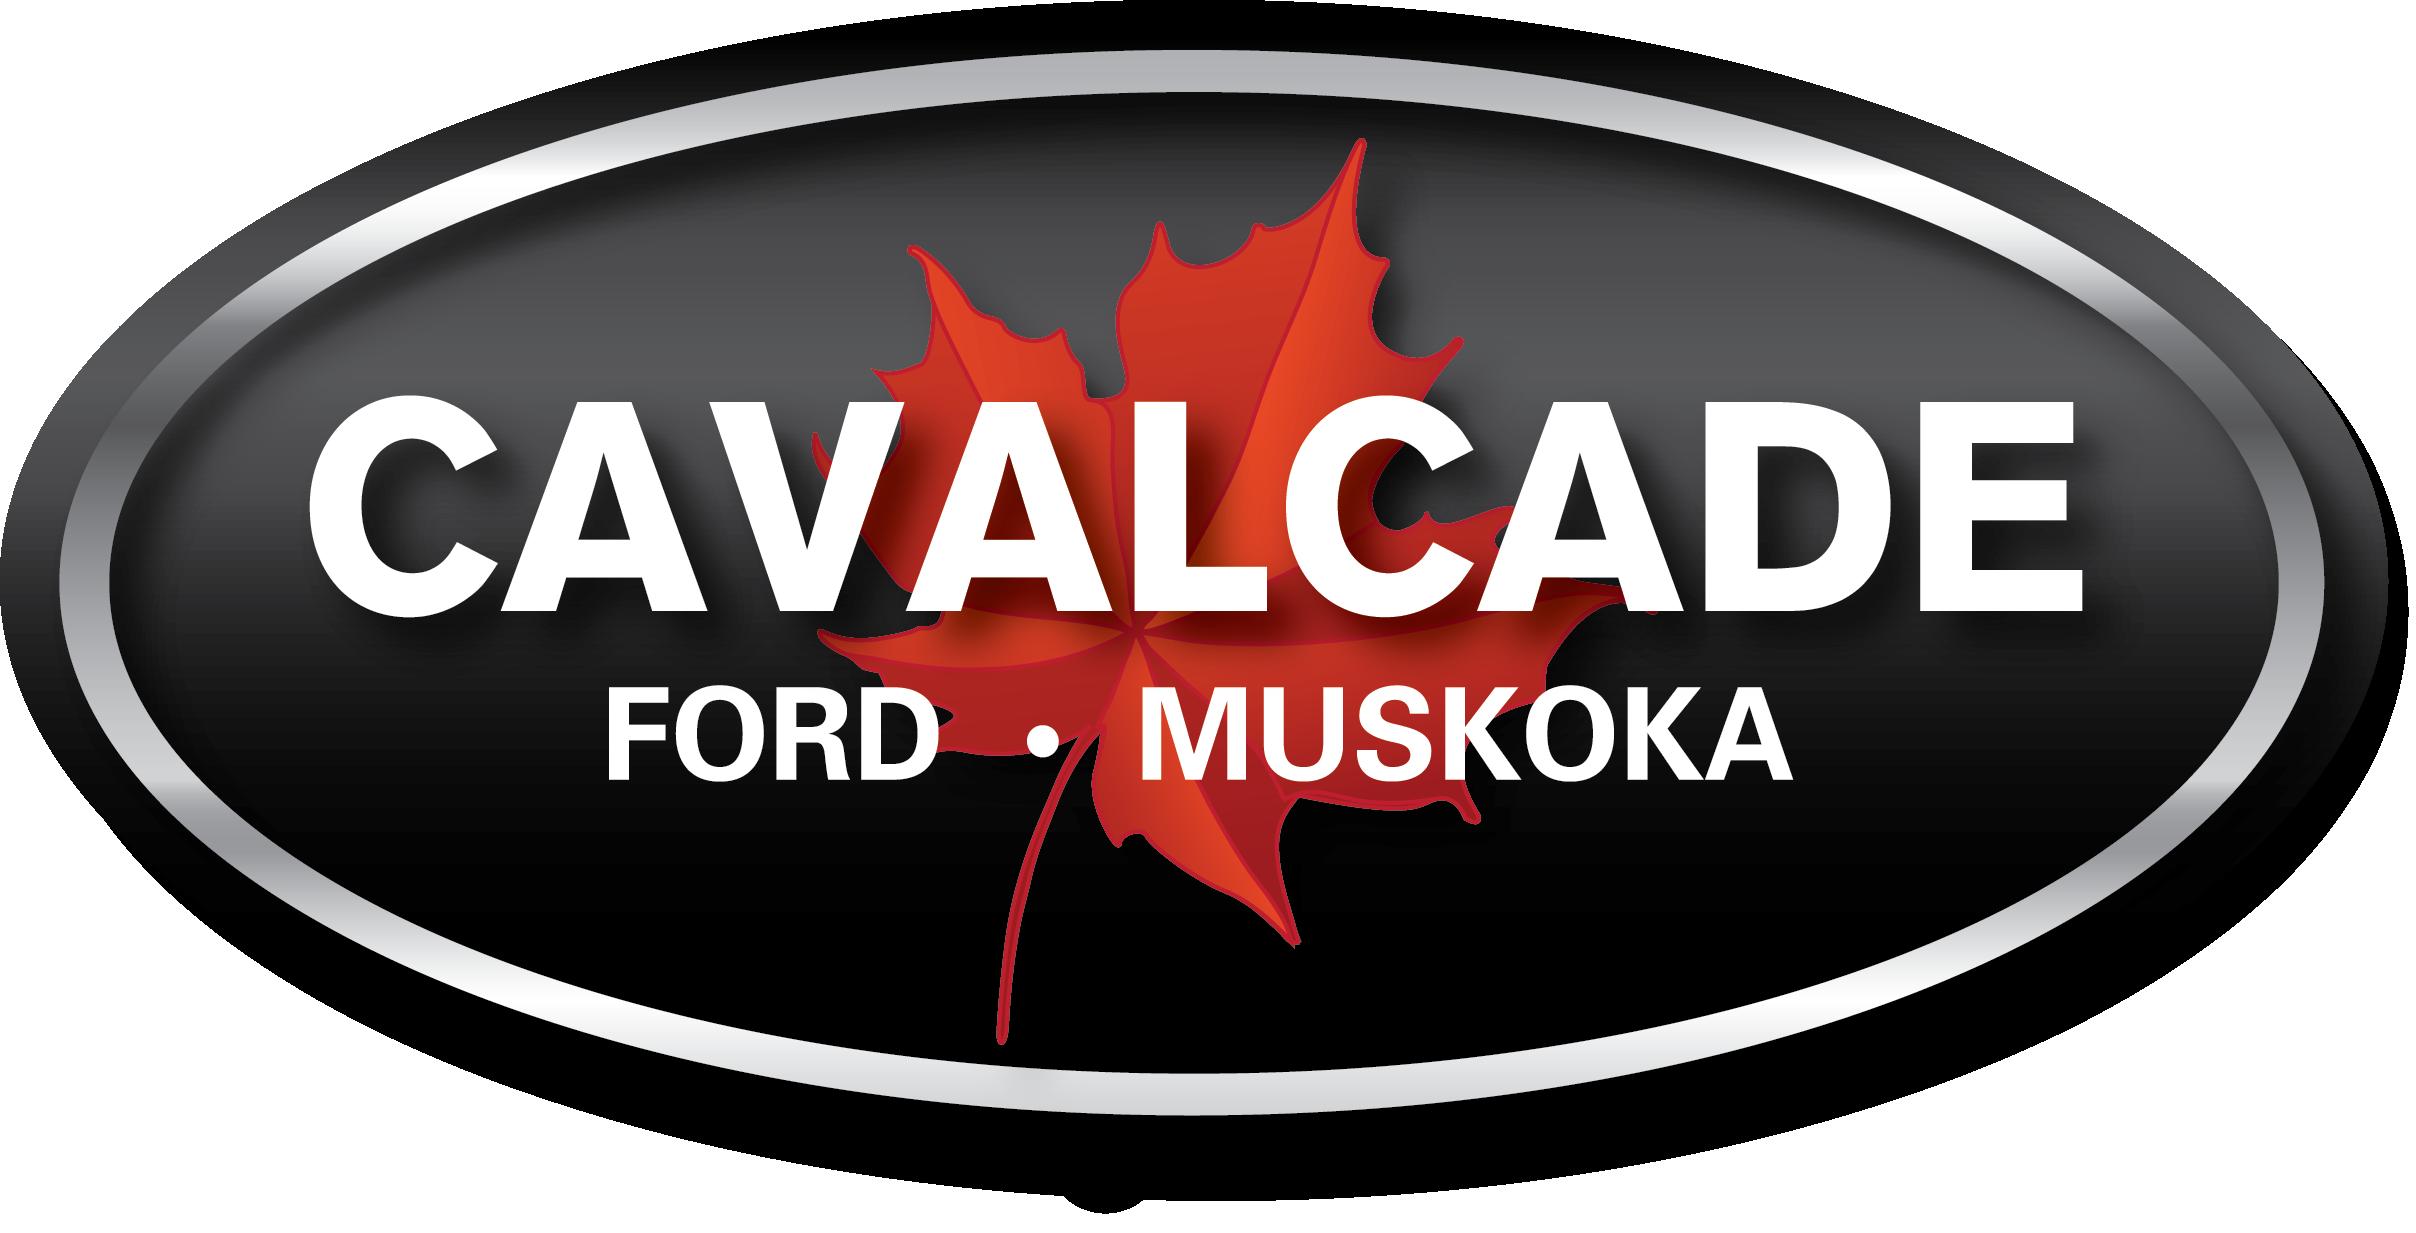 Cavalcade Ford - Muskoka